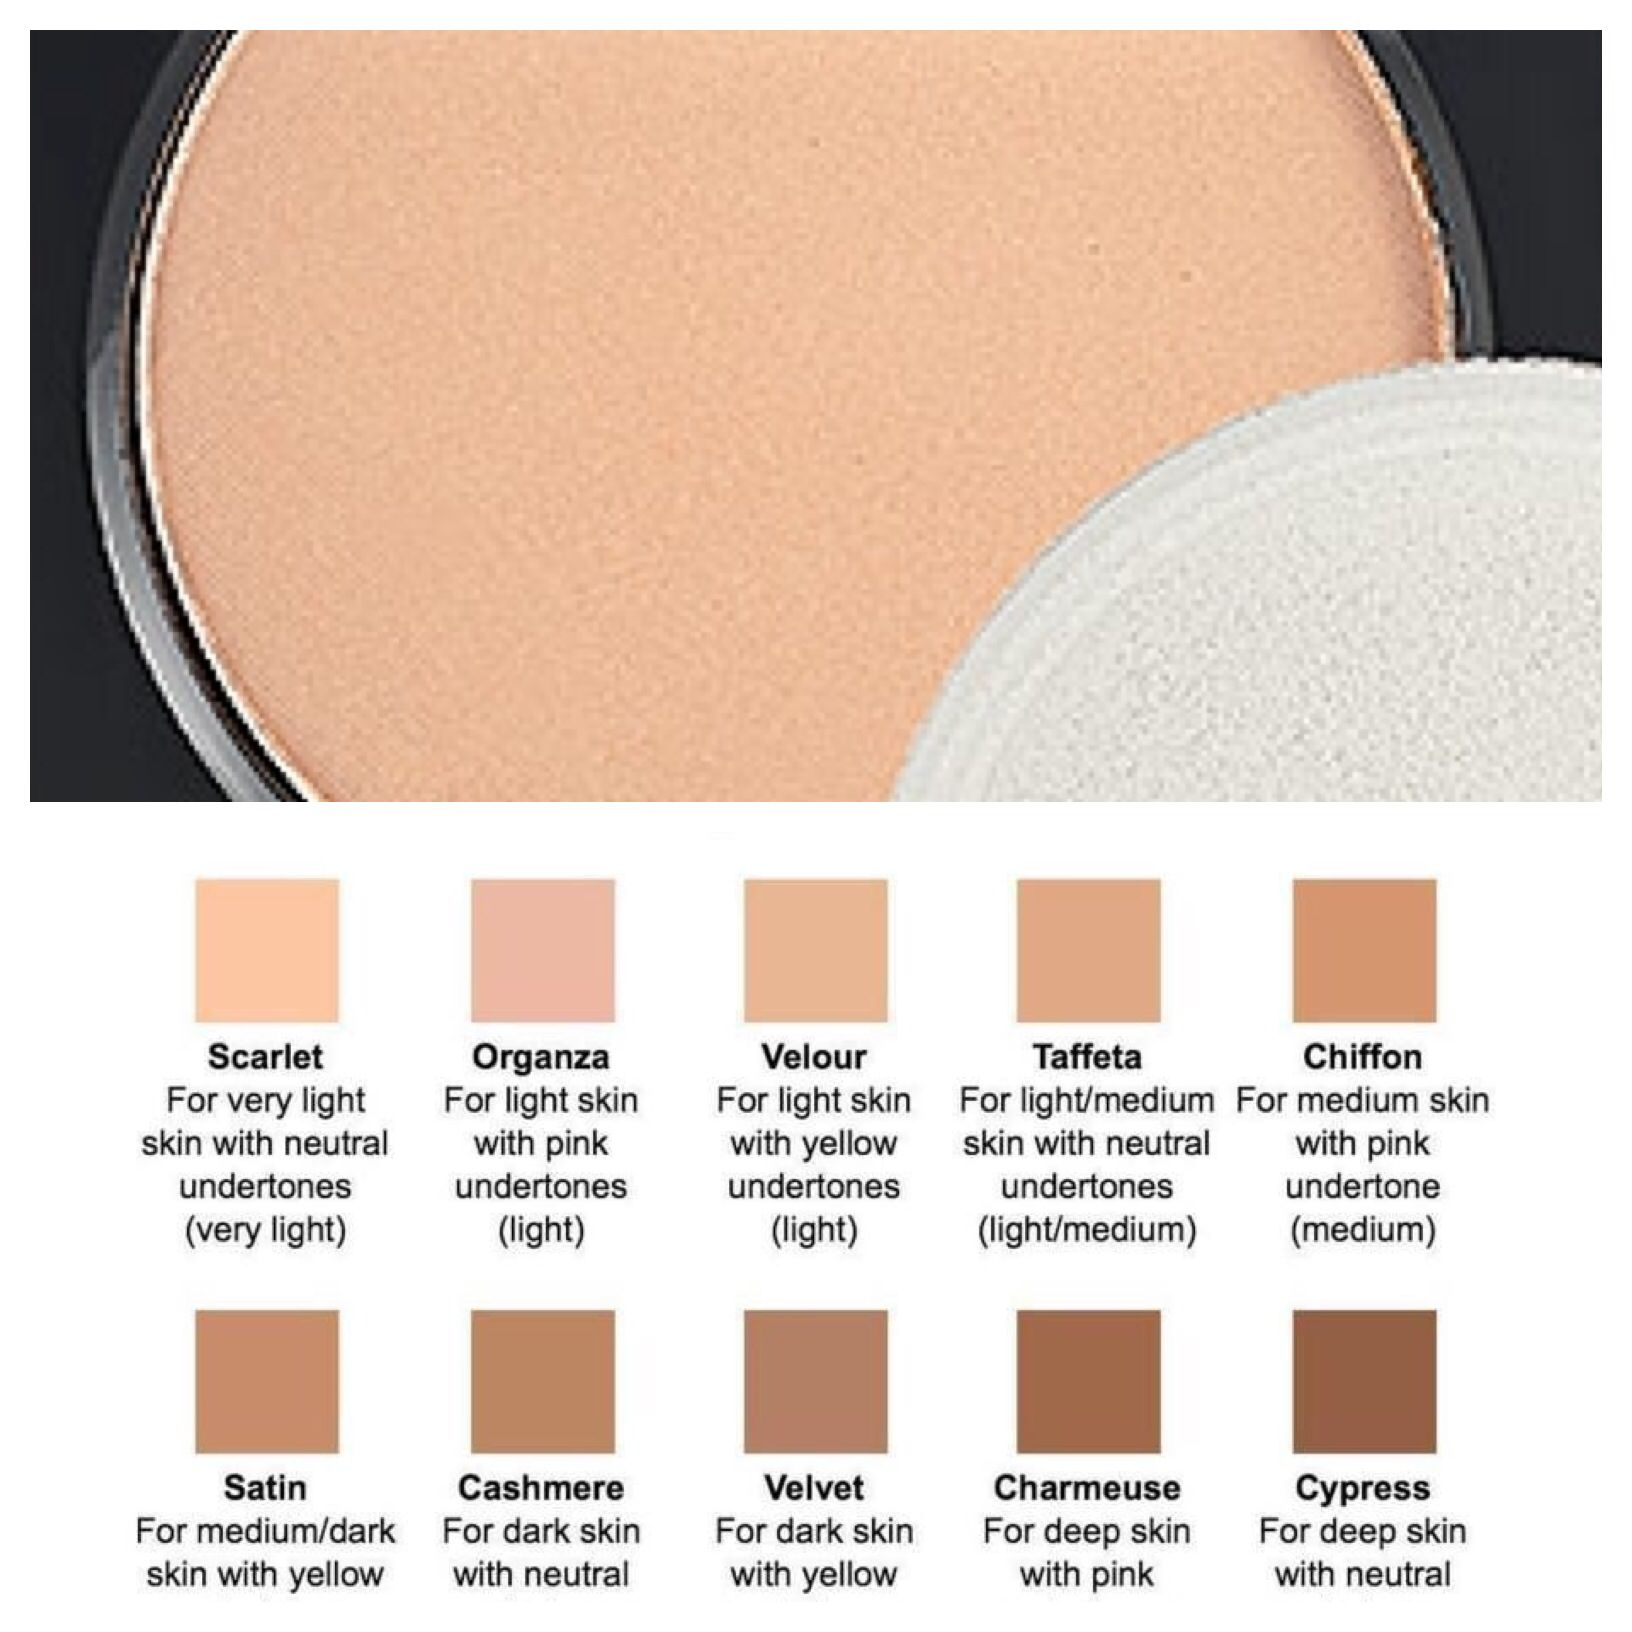 Younique Makeup Color Chart Dat Night